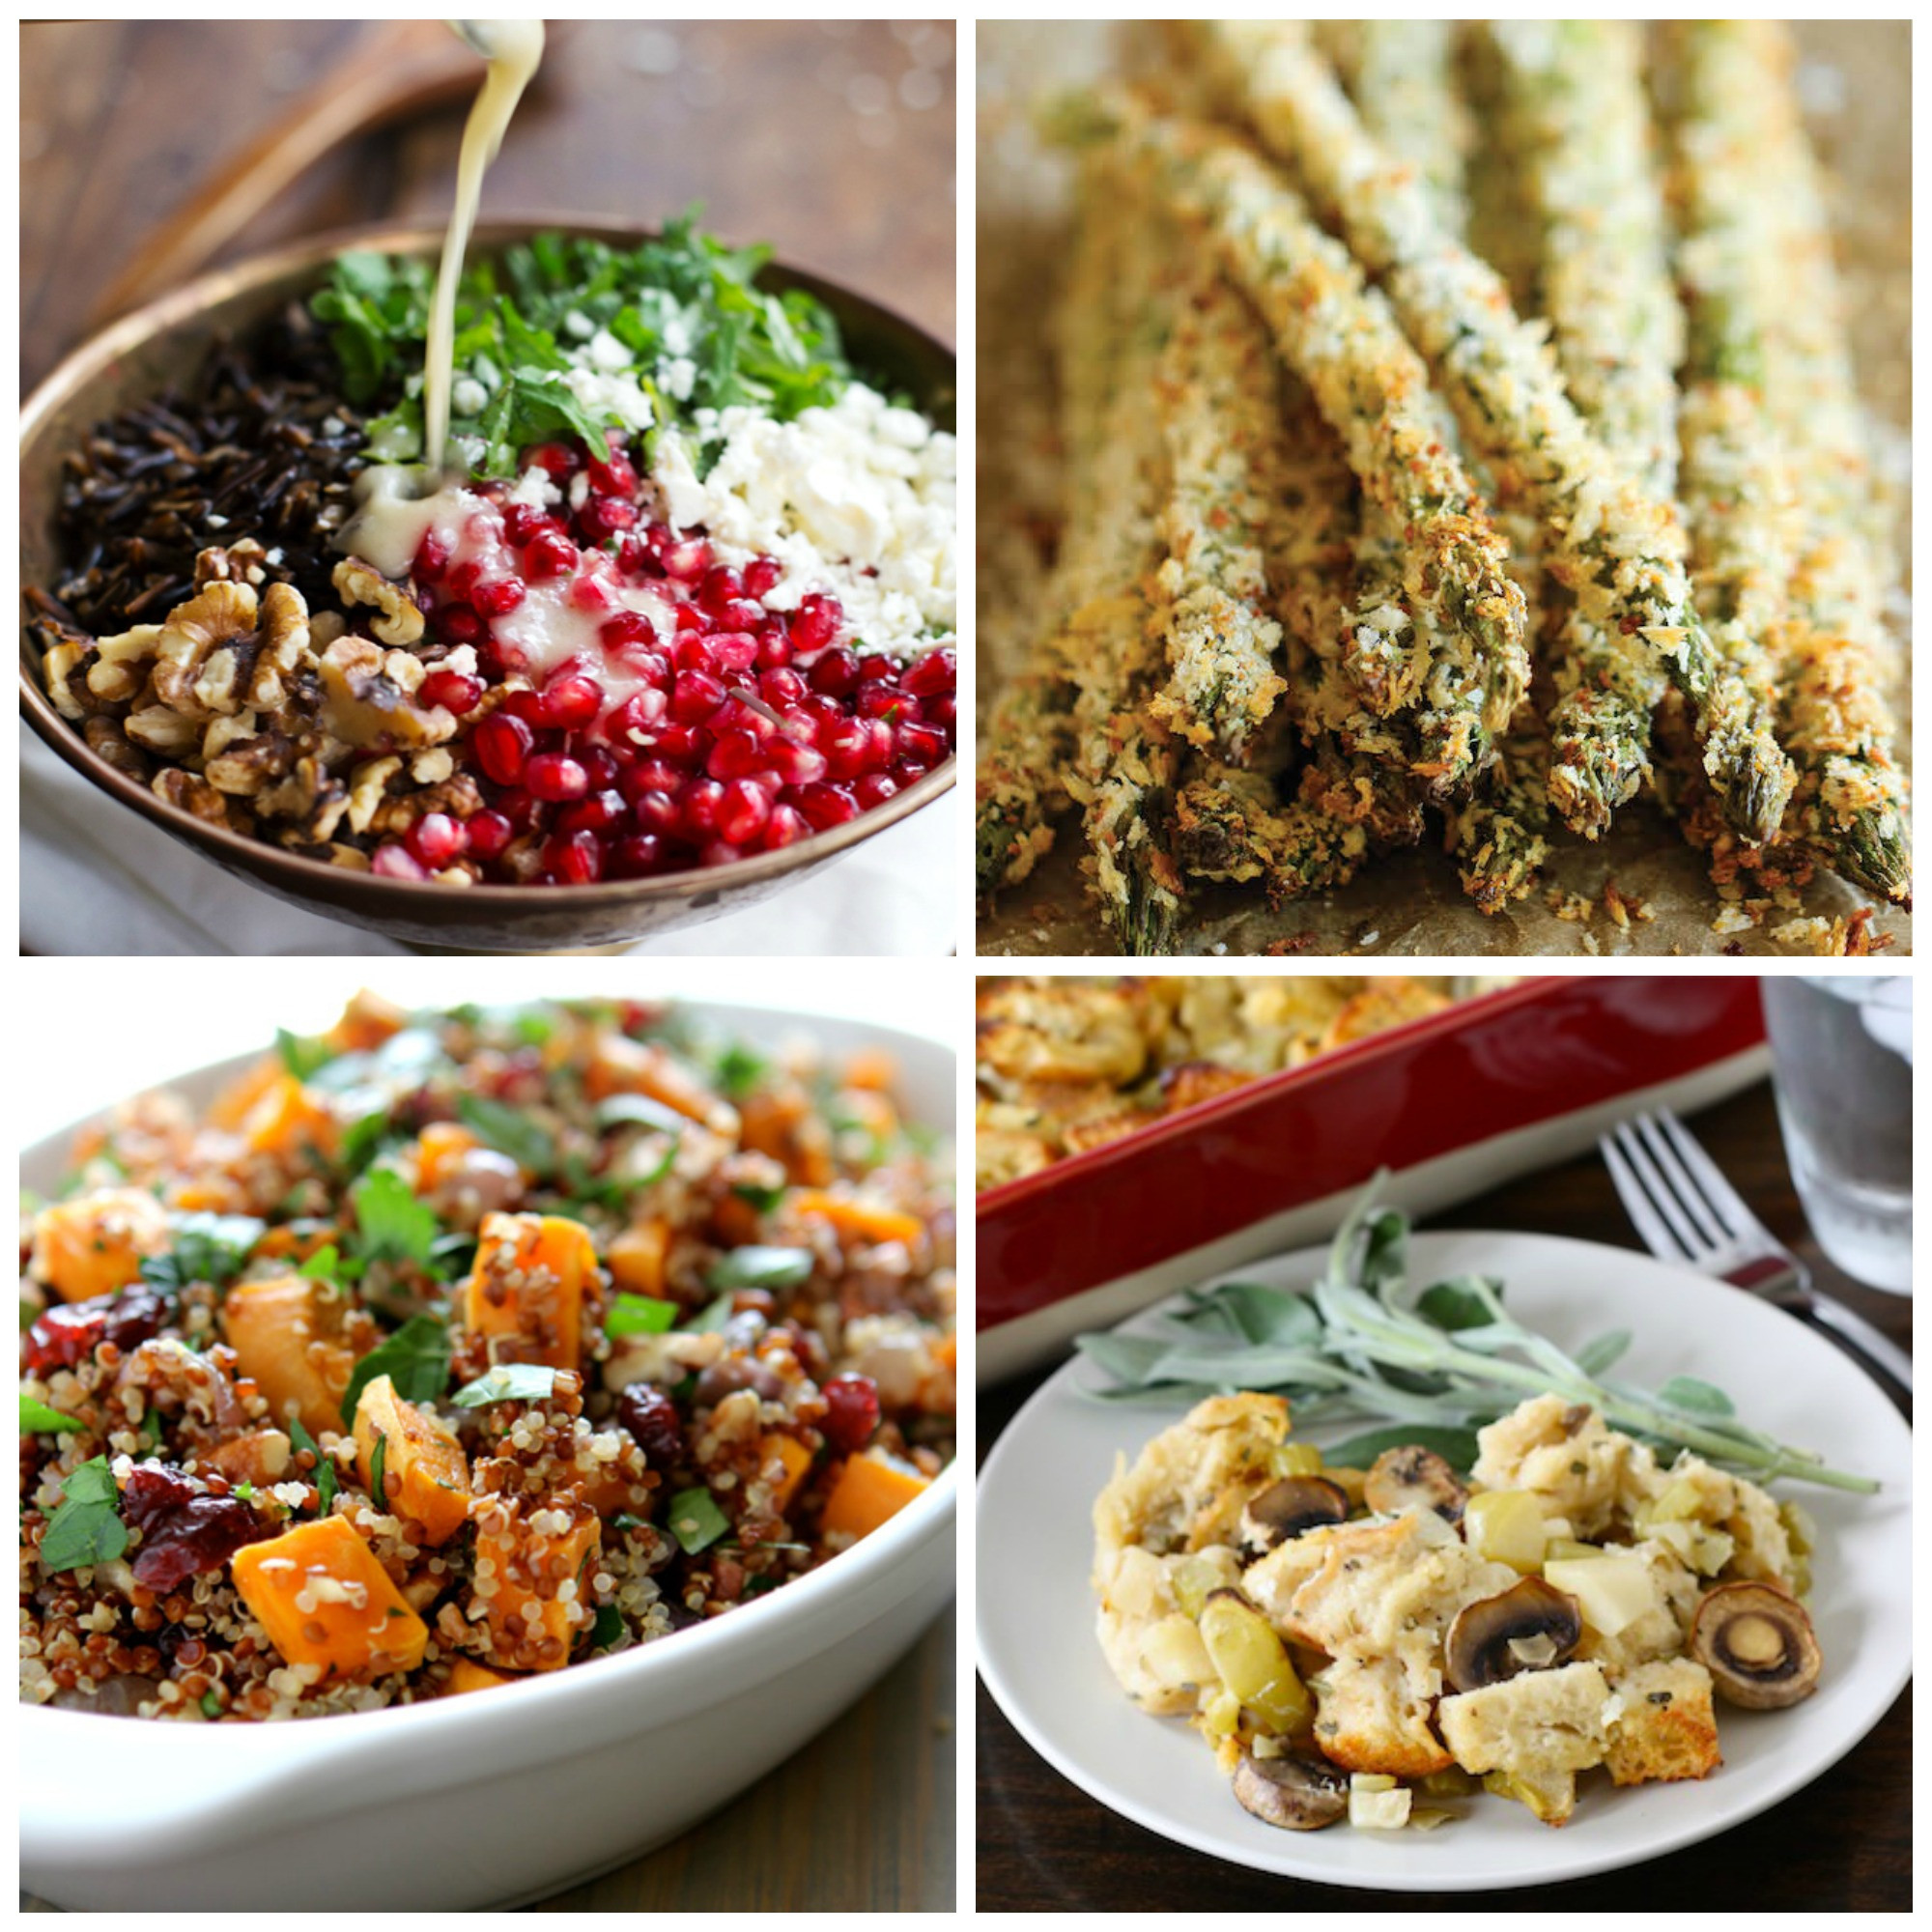 Vegetarian Side Dishes For Thanksgiving  Ve arian Thanksgiving dishes that even meat lovers will